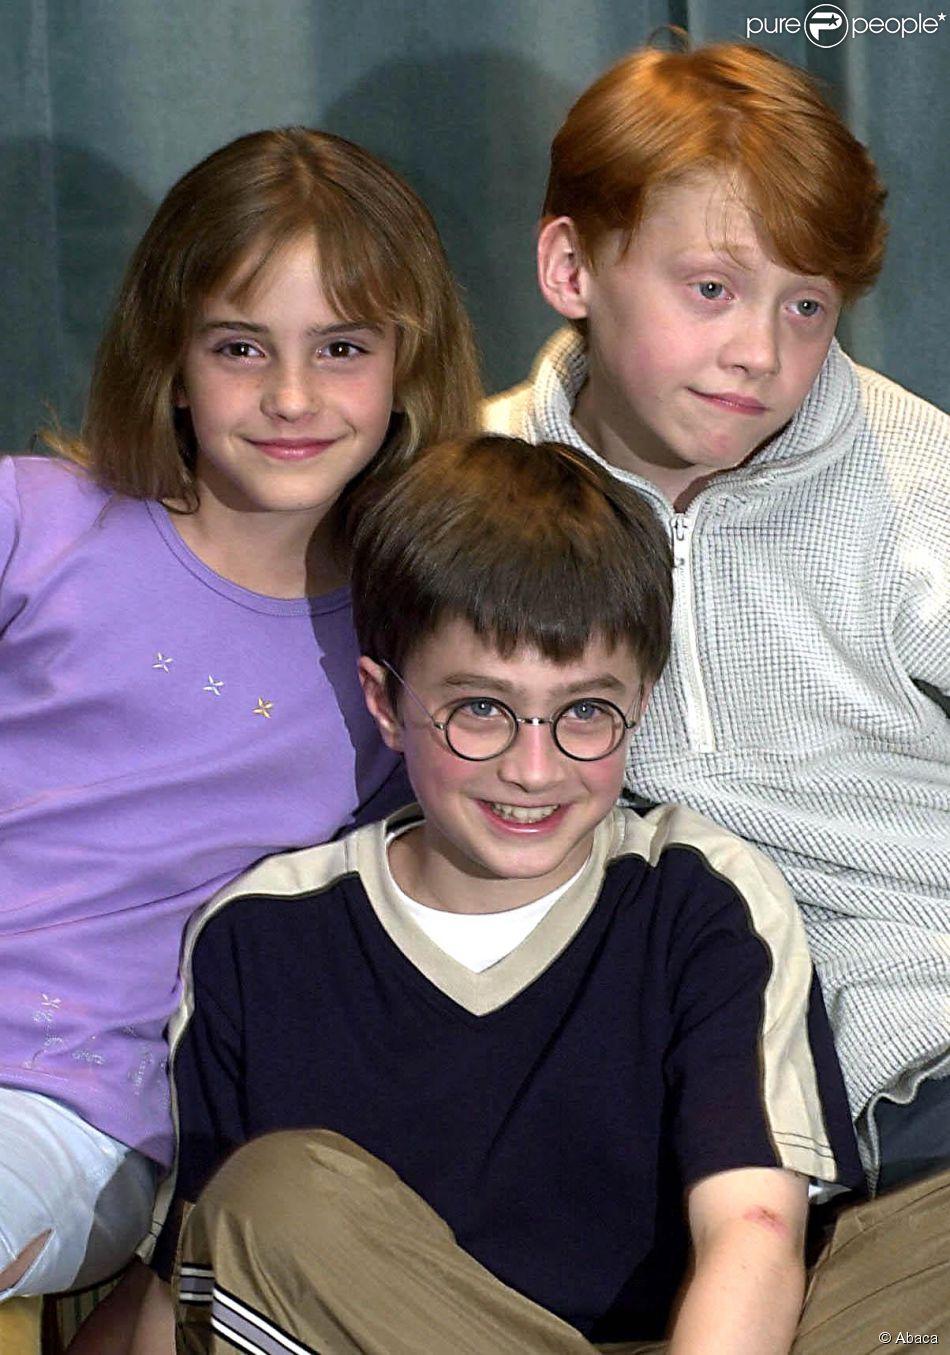 Harry Potter 2 Film Complet En Francais | MEJOR CONJUNTO DE FRASES